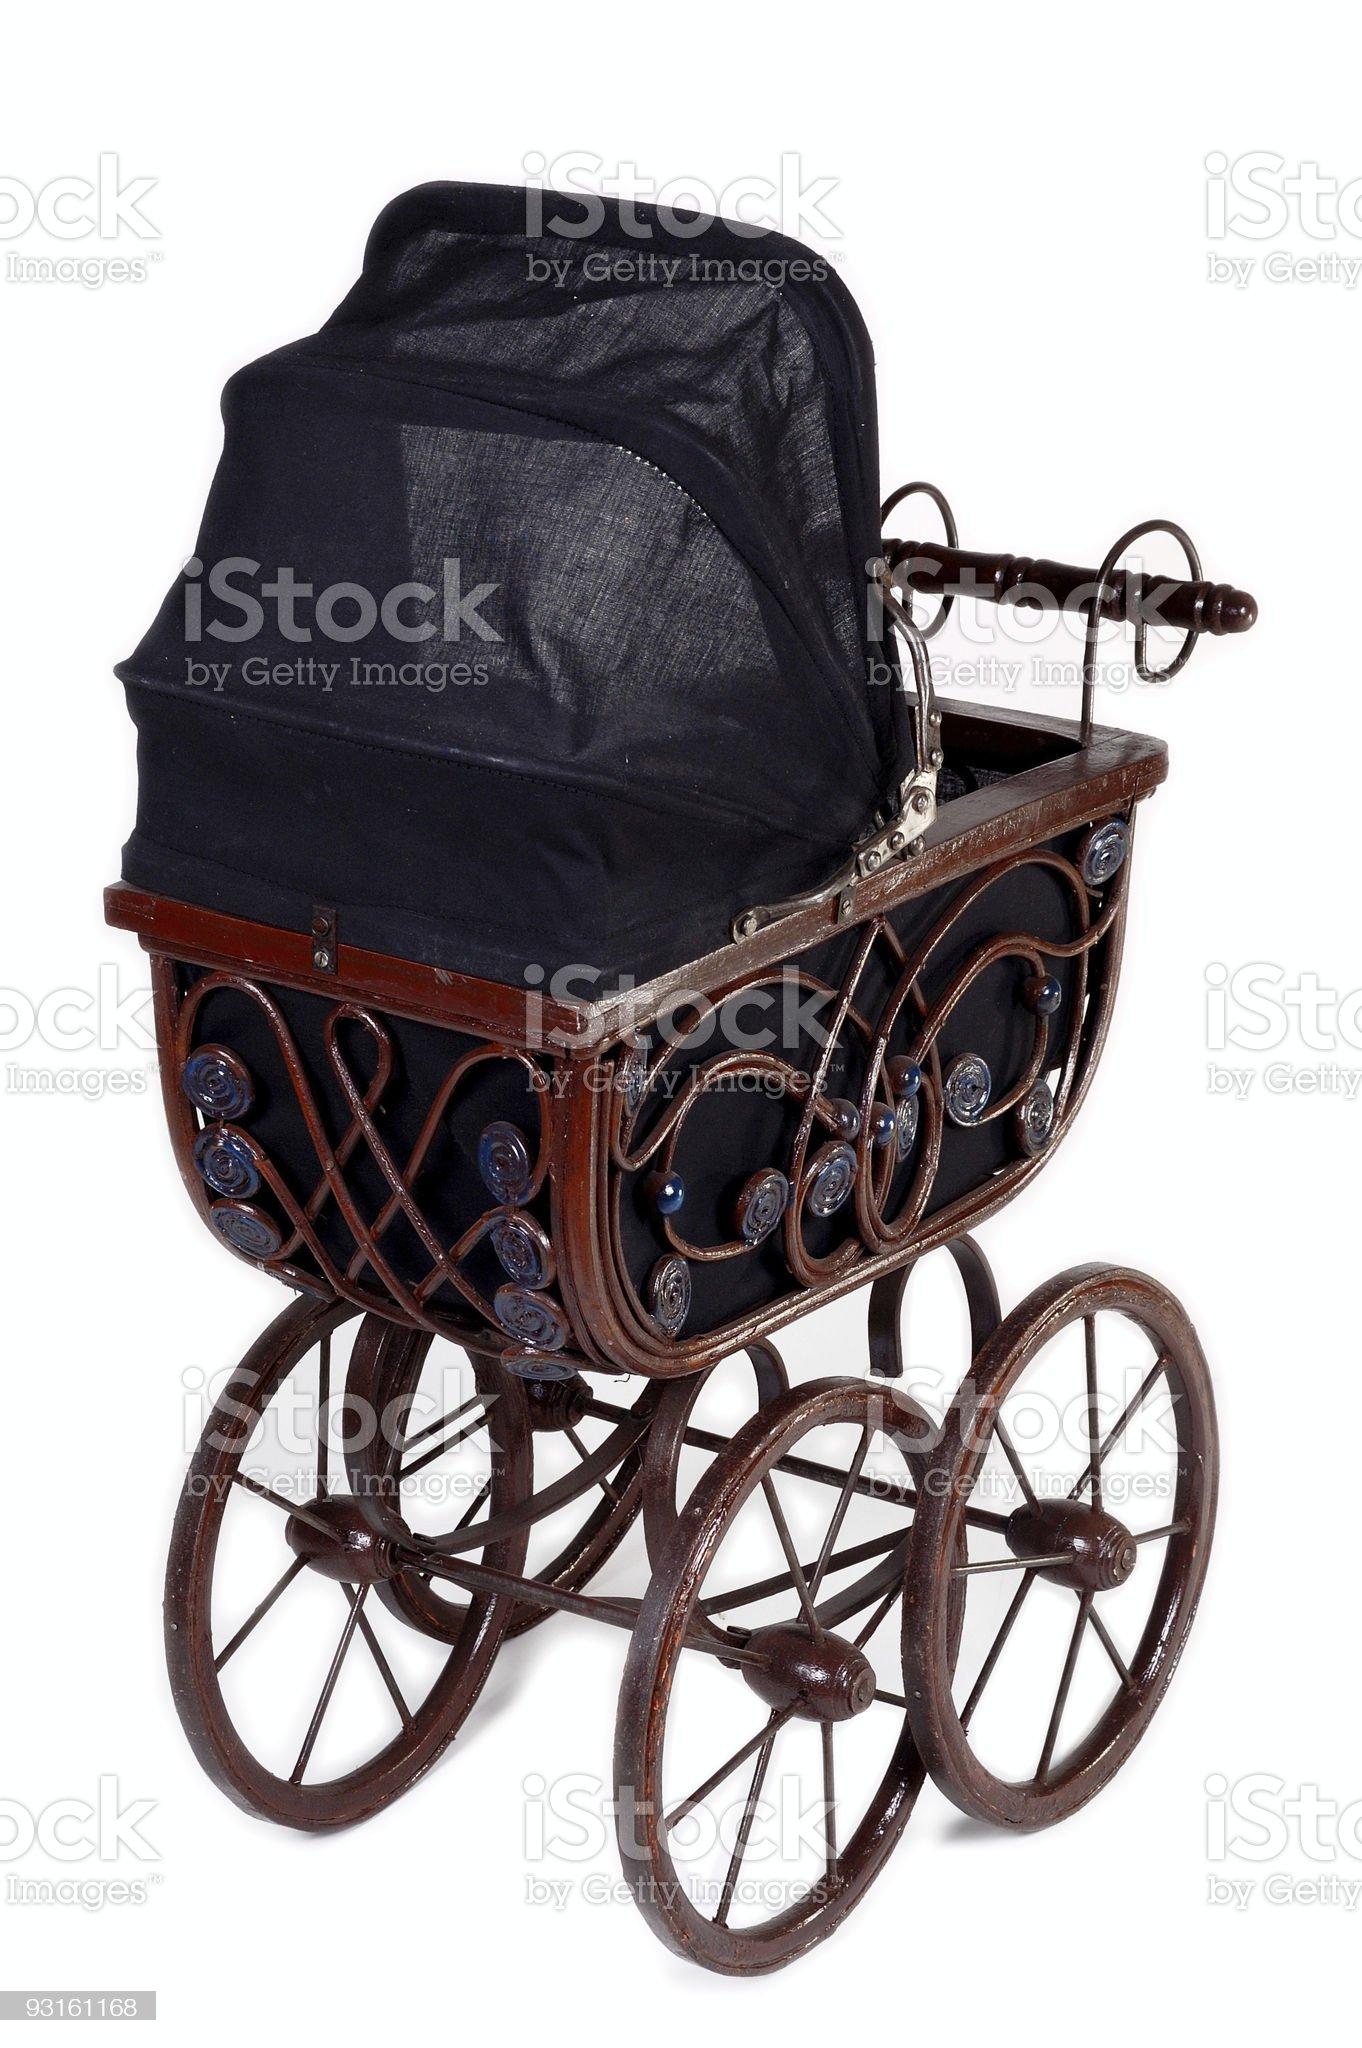 Old stroller v2. royalty-free stock photo